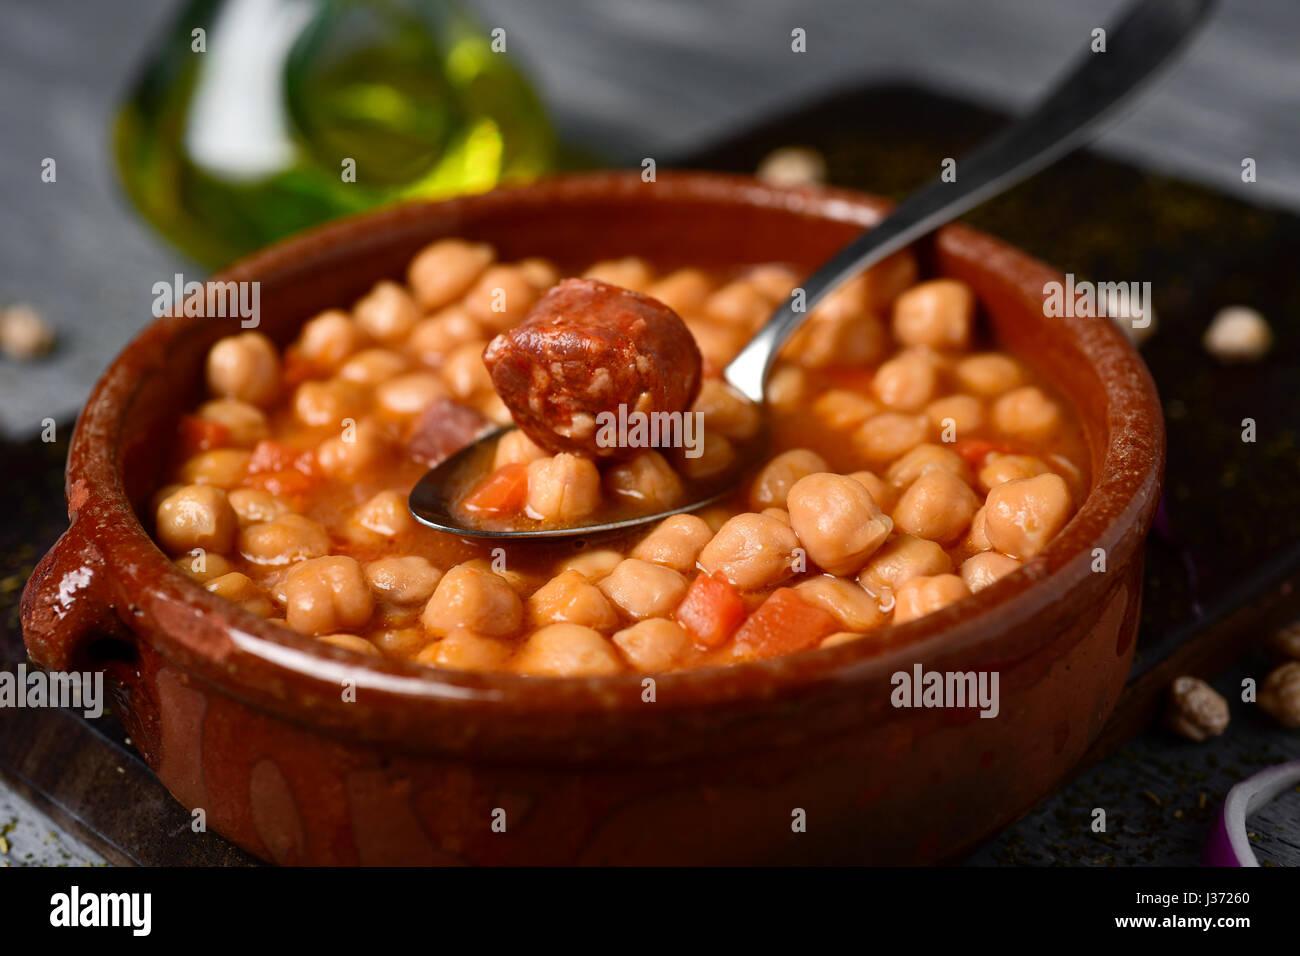 closeup of an earthenware bowl with potaje de garbanzos, a spanish chickpeas stew with chorizo and serrano ham, - Stock Image